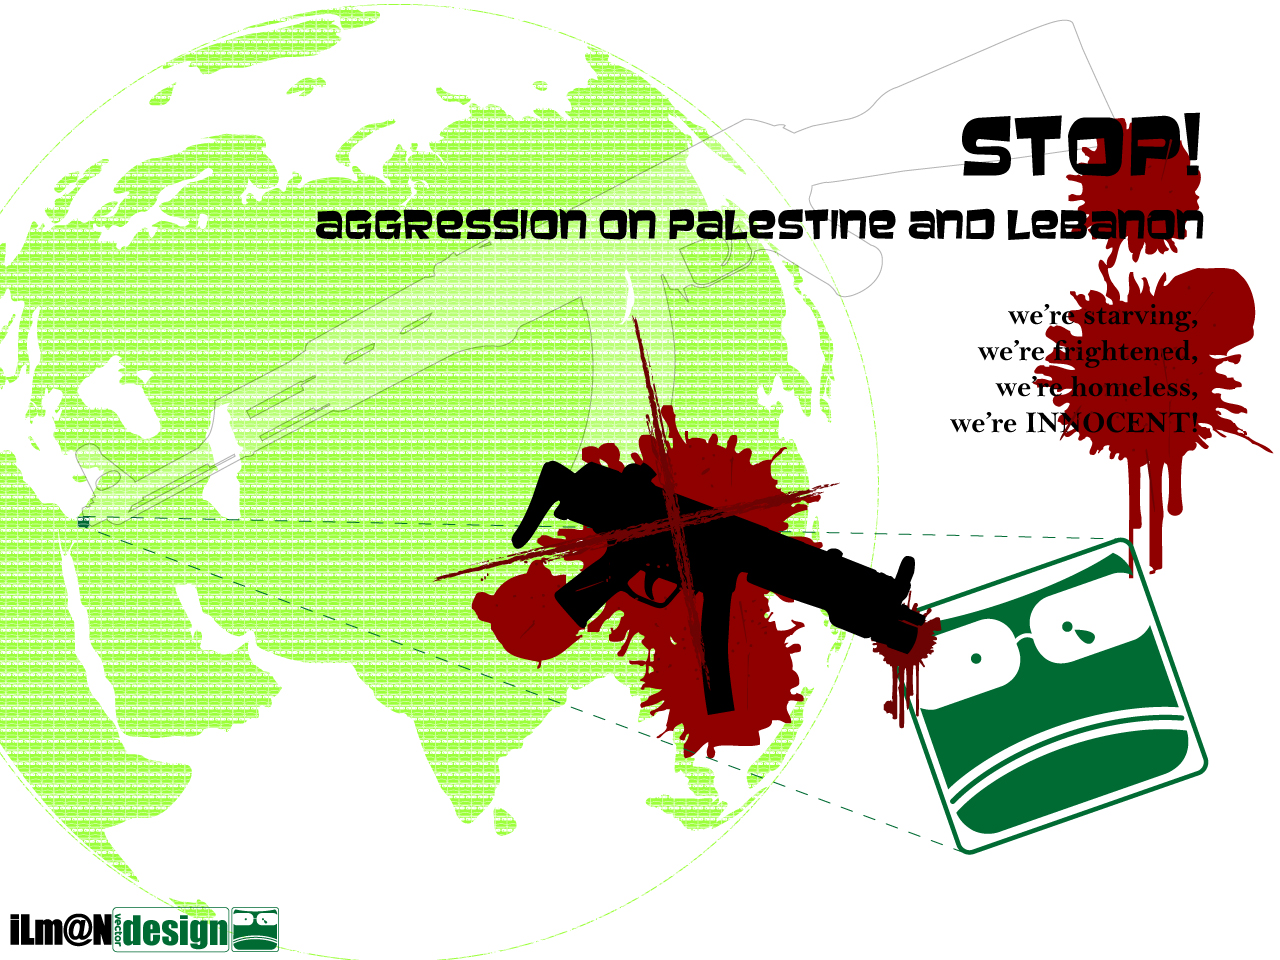 Save Palestine and Lebanon